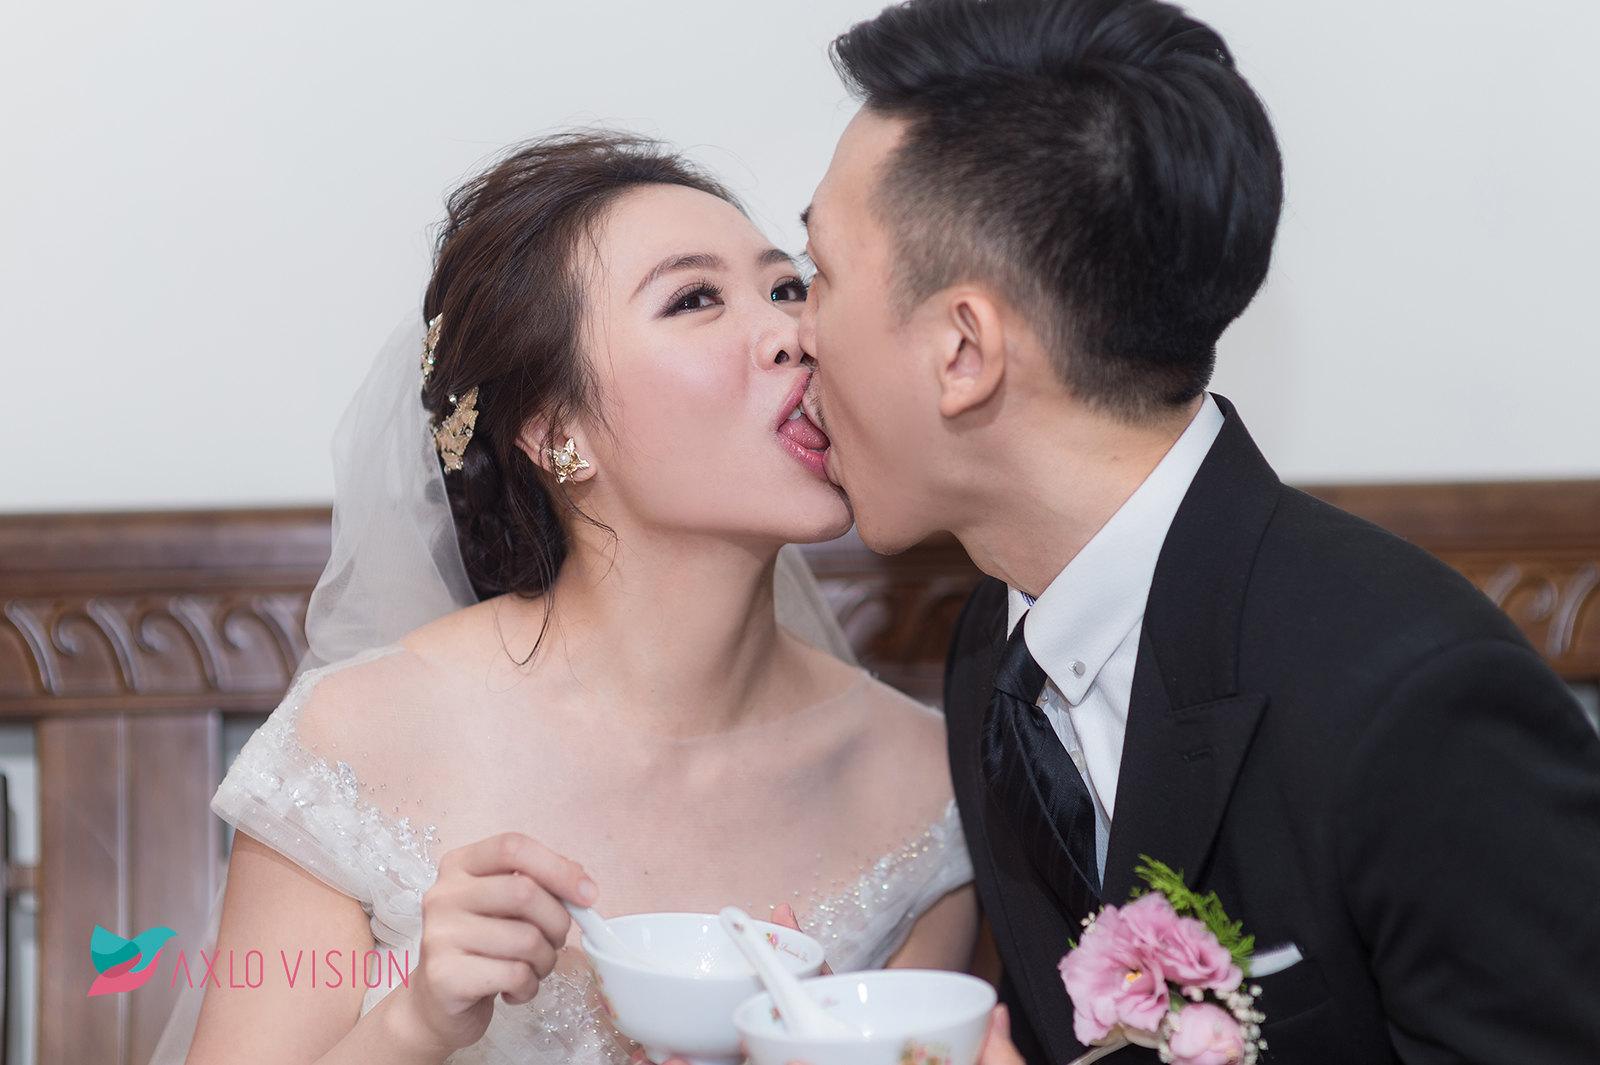 20170916 WeddingDay_125